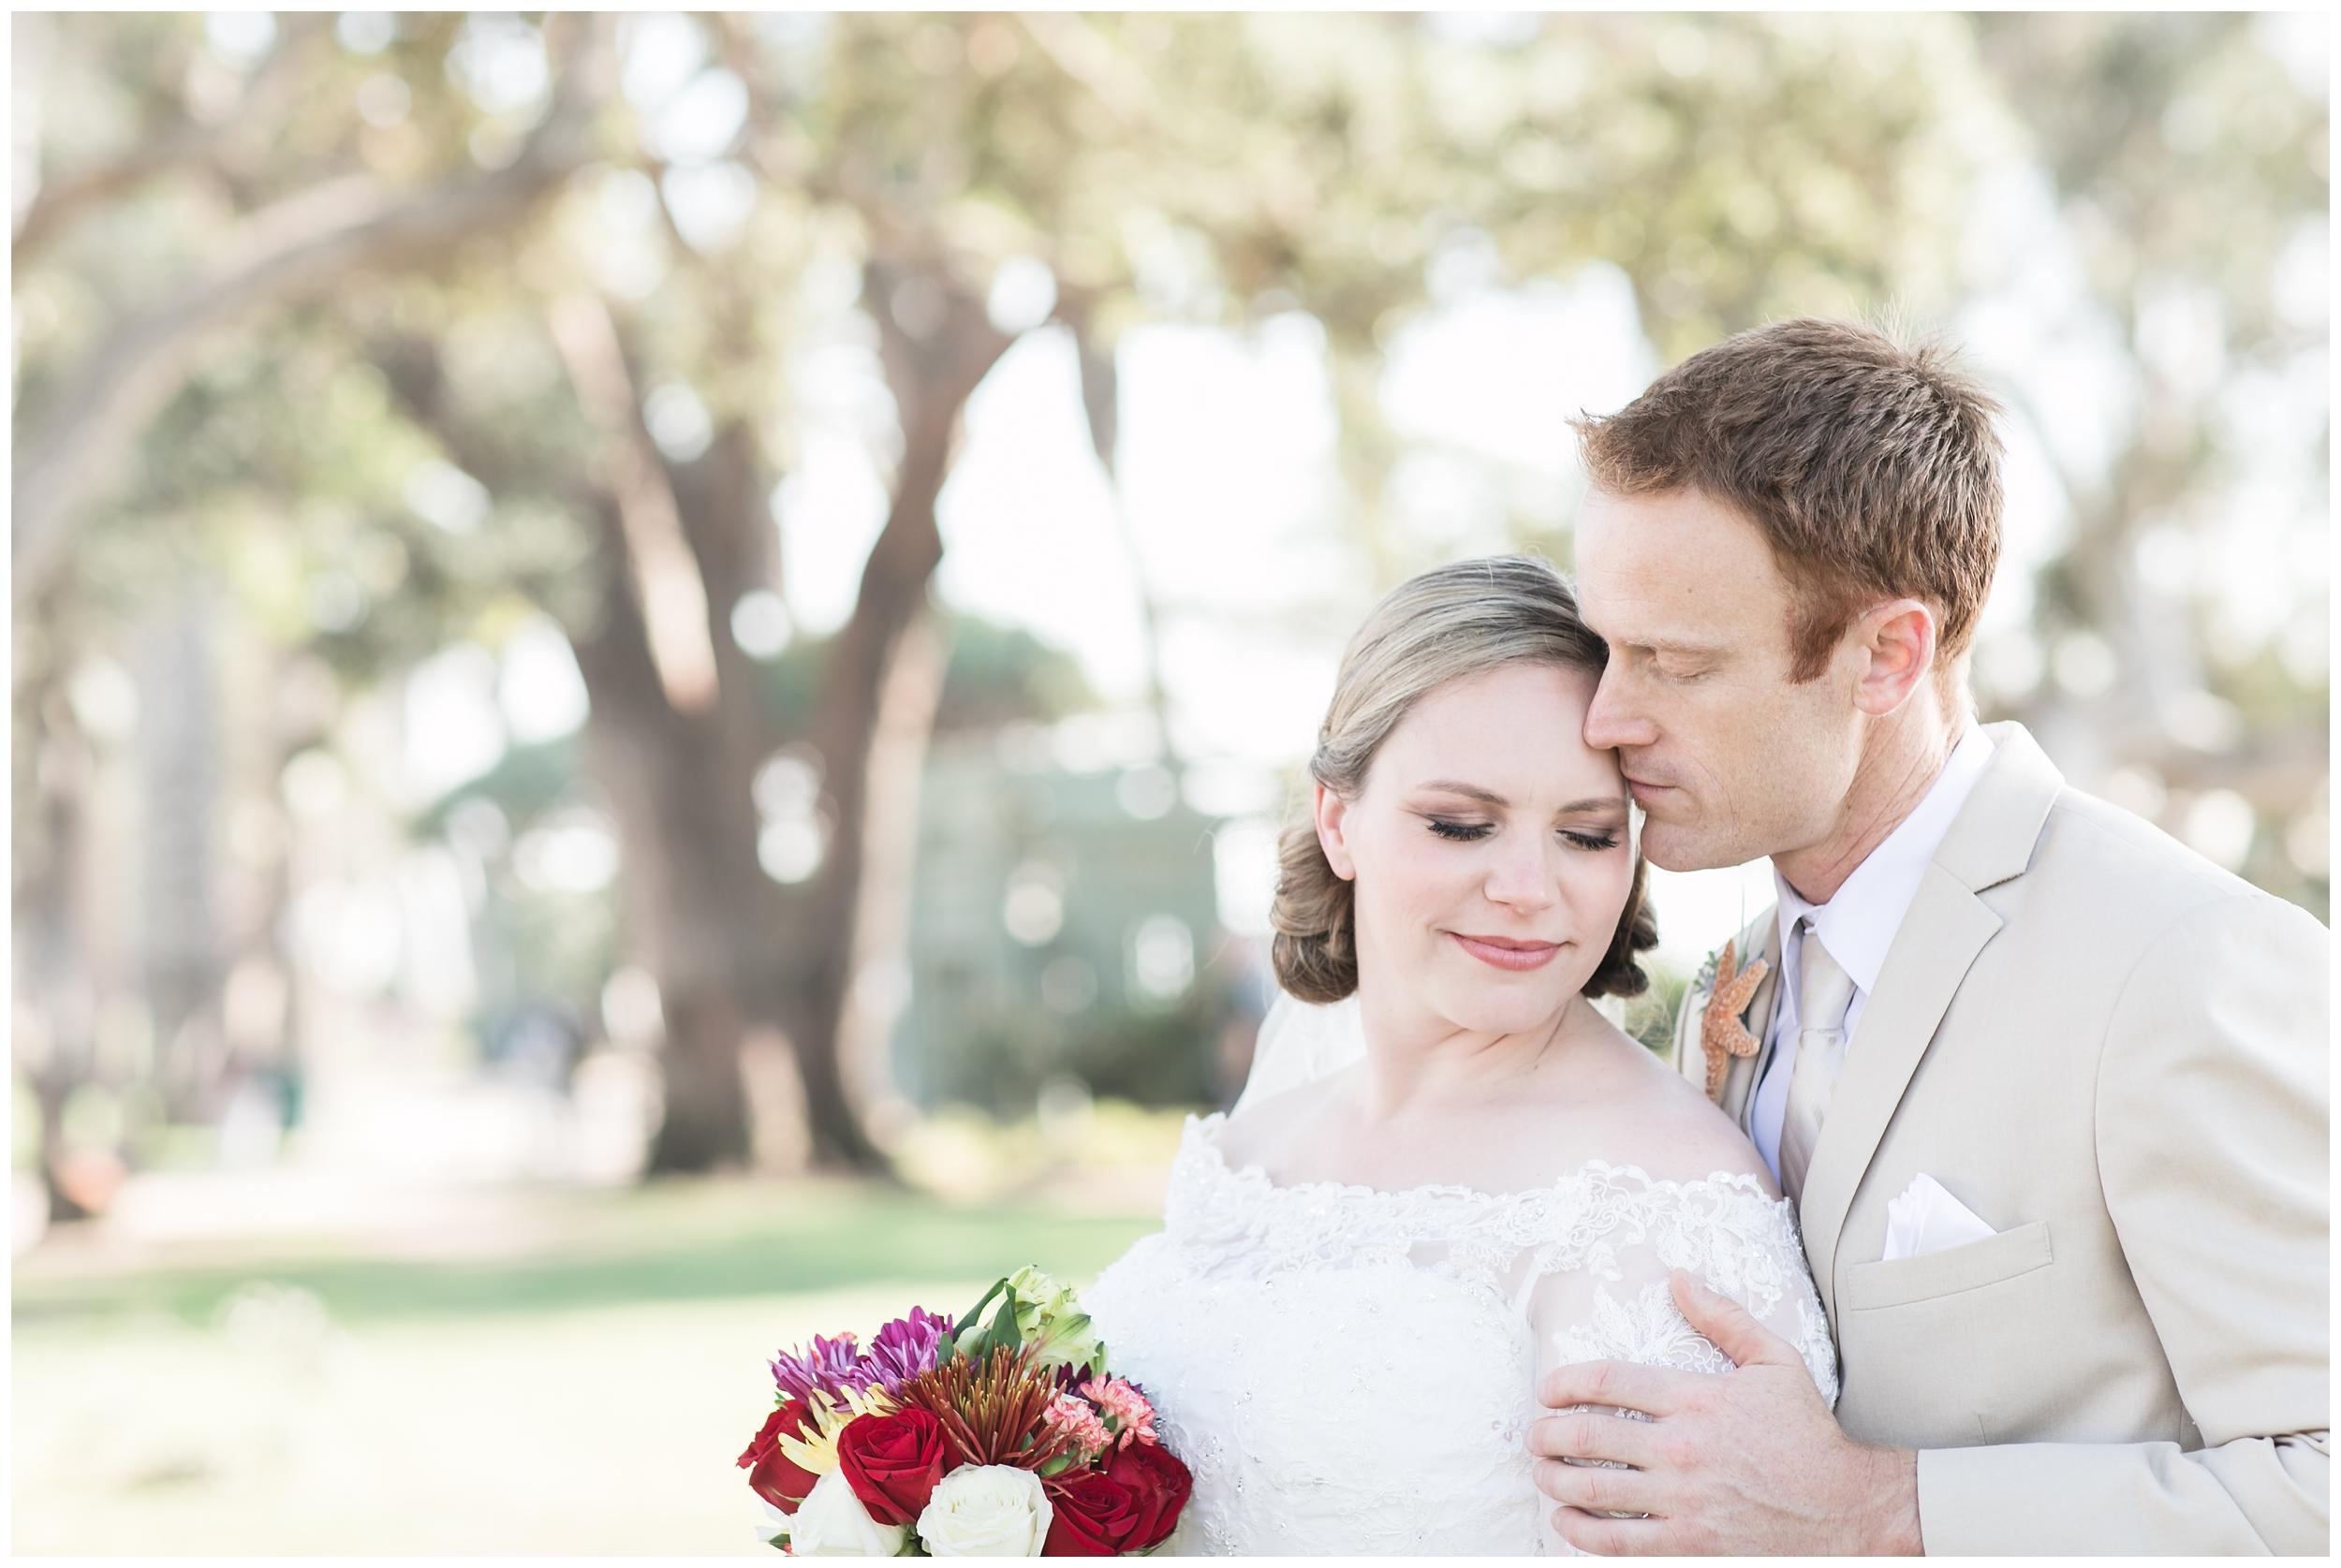 Santa Monica Beach Themed Wedding Carrie Vines wedding photography UCLA wedding